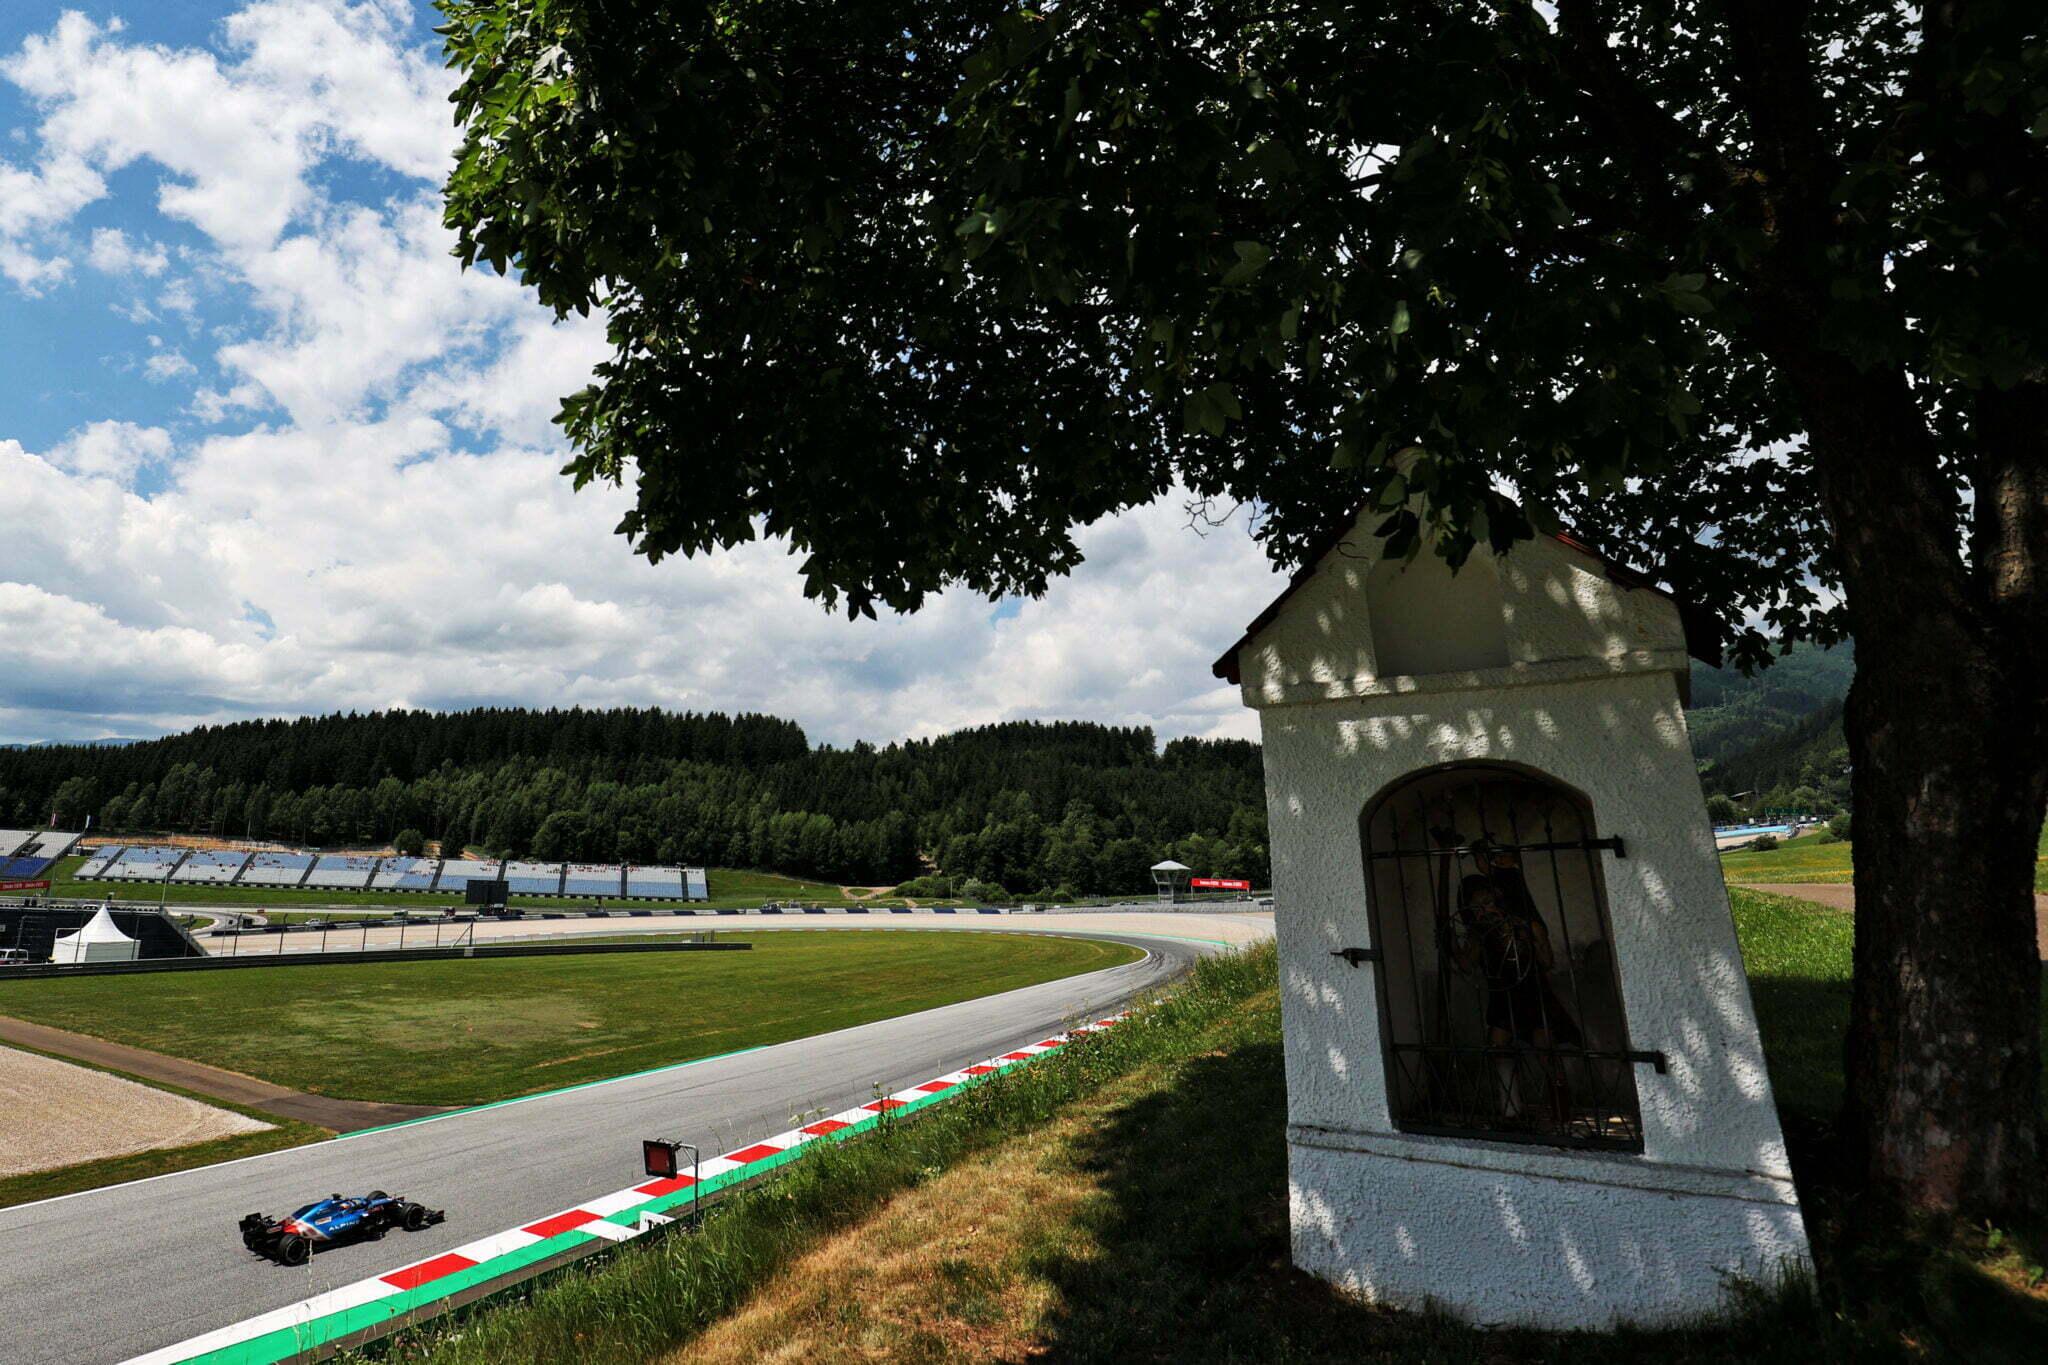 Alpine F1 Team Alonso Ocon Autriche Steiermark Grand Prix Spielberg A521 2021 18 | Alpine F1 : Alonso rapporte deux points au Grand Prix BWT de Styrie